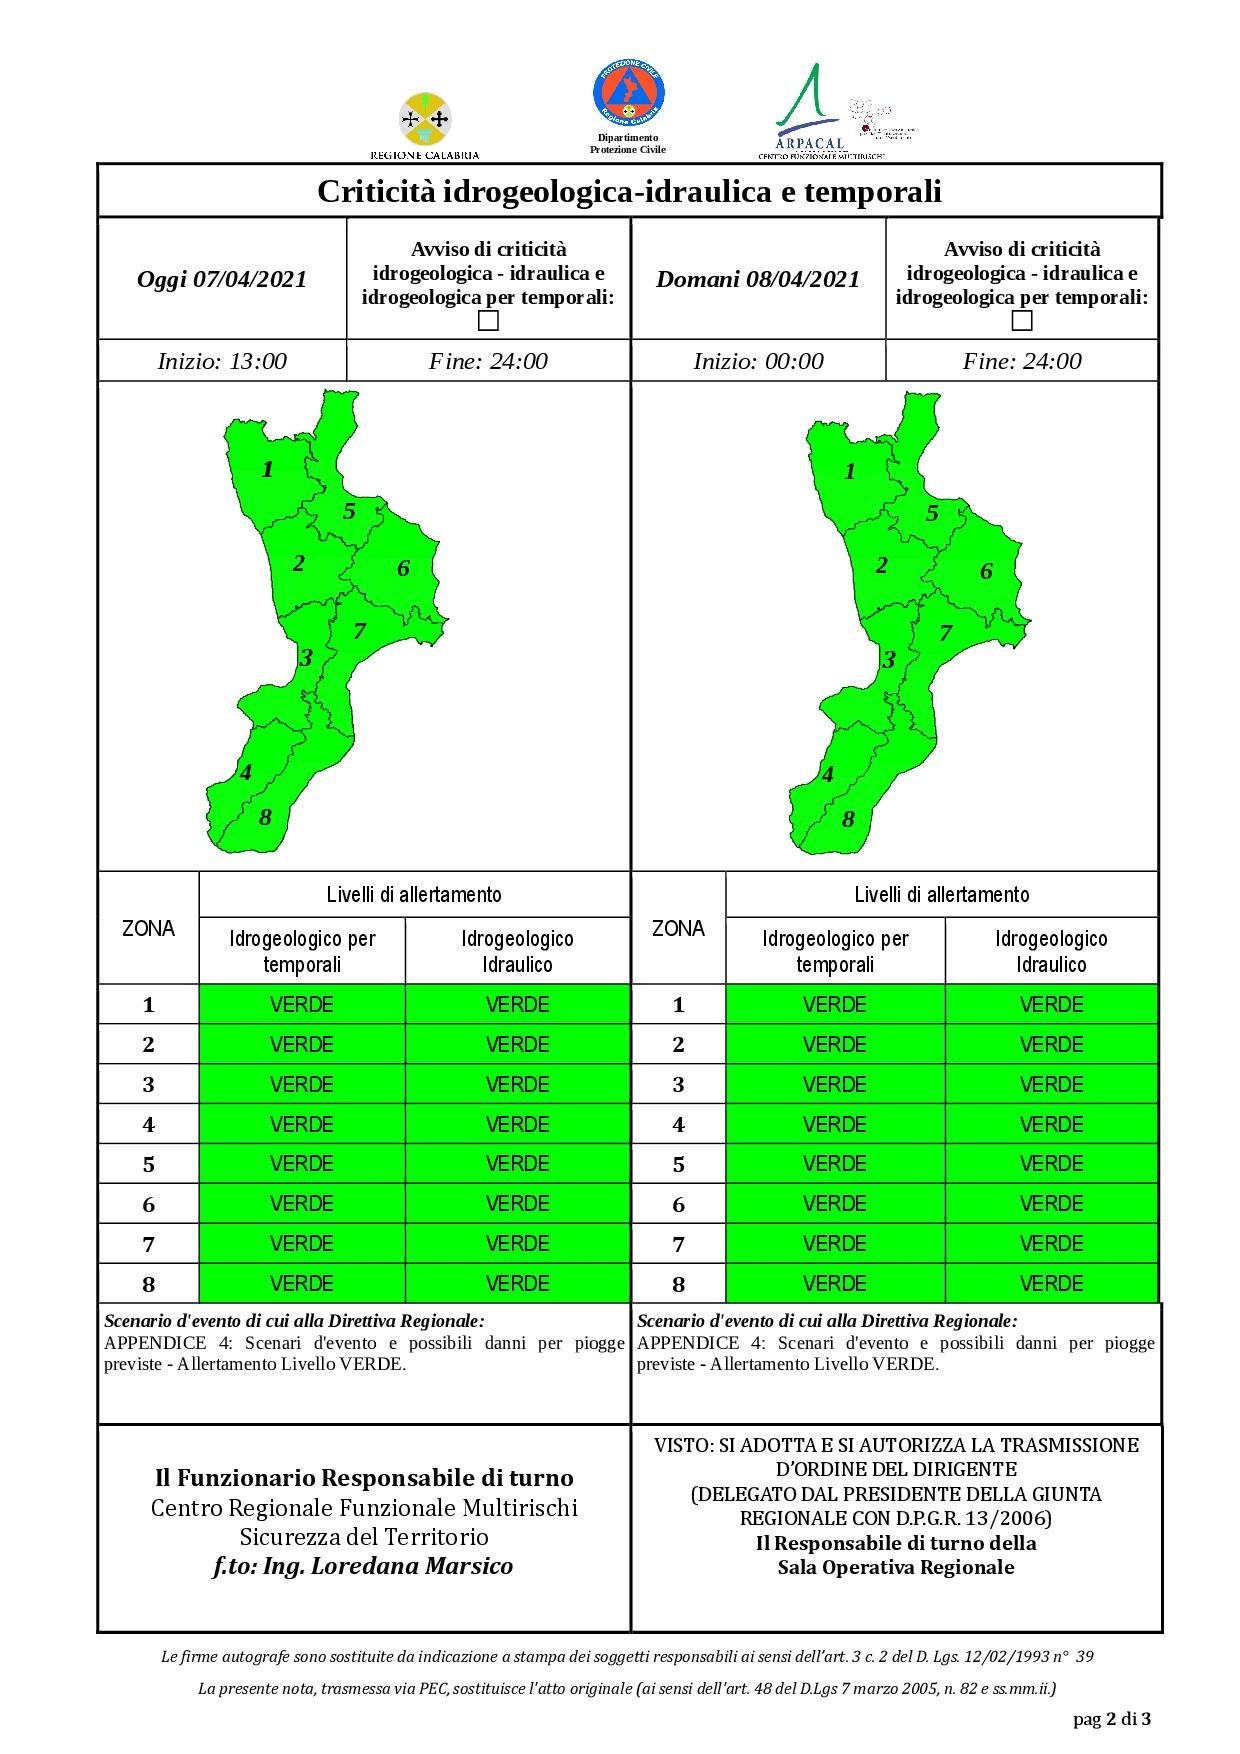 Criticità idrogeologica-idraulica e temporali in Calabria 07-04-2021